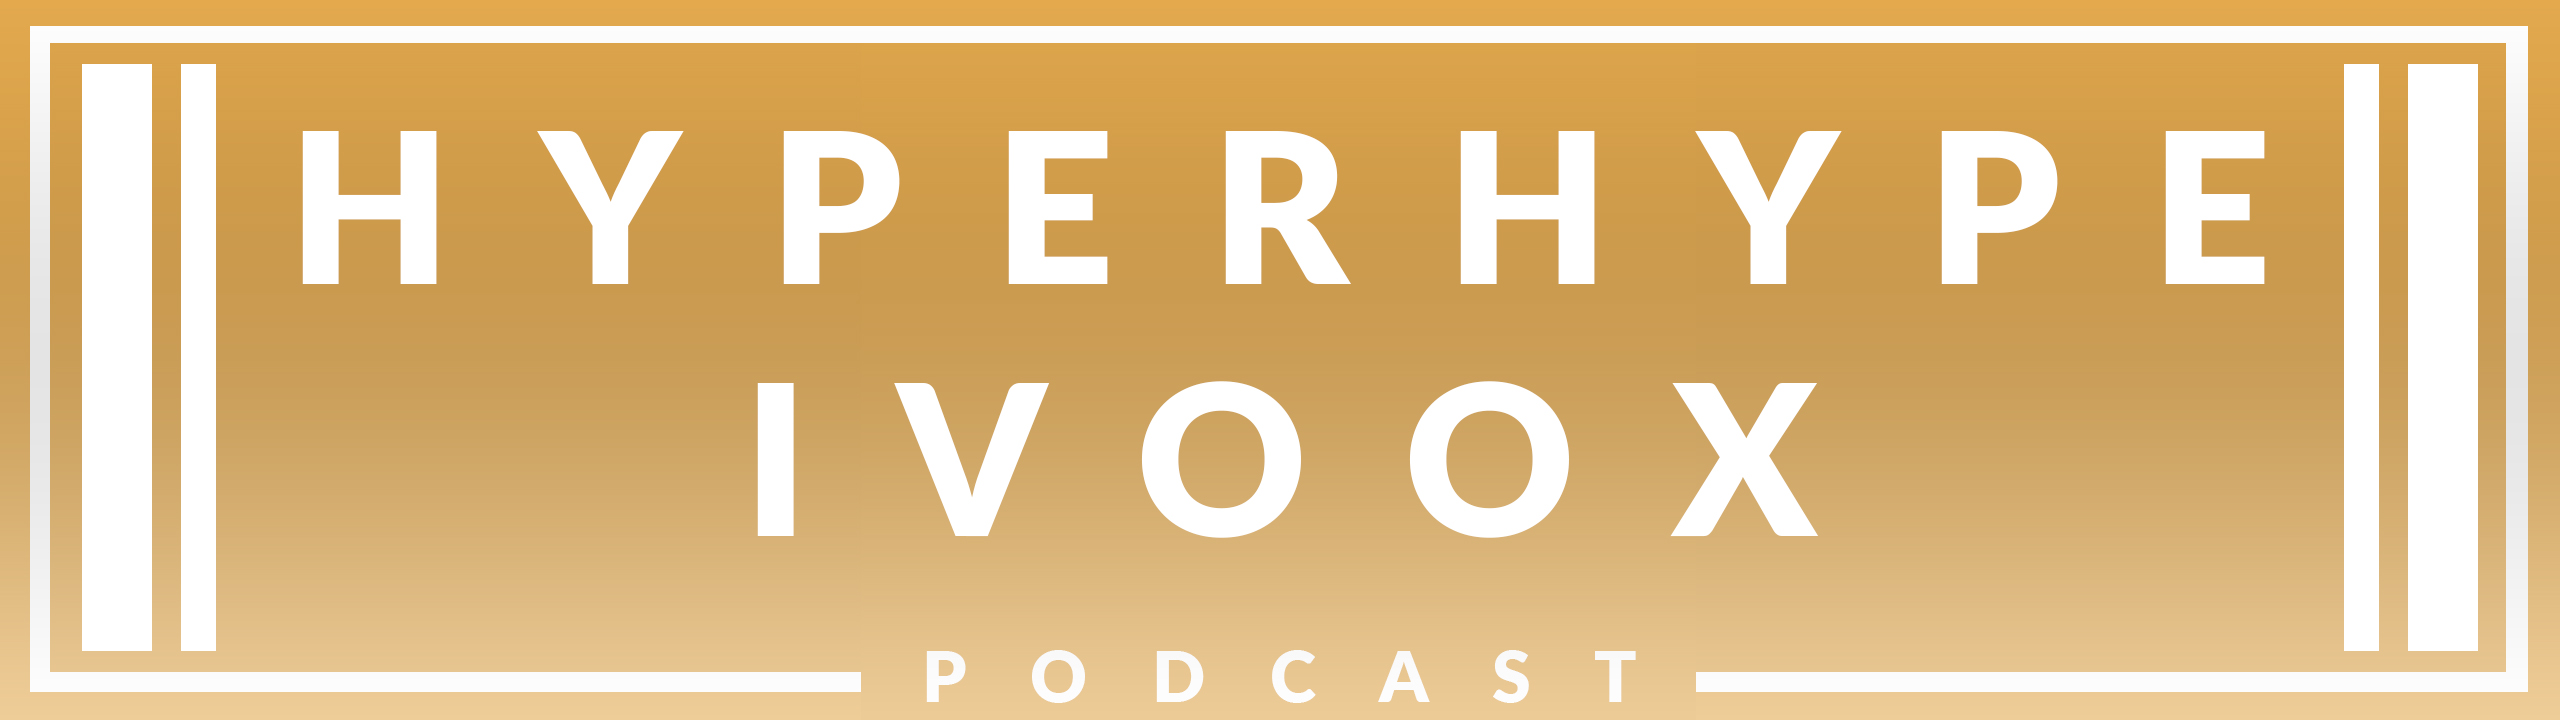 HyperHype-Podcast-Ivoox